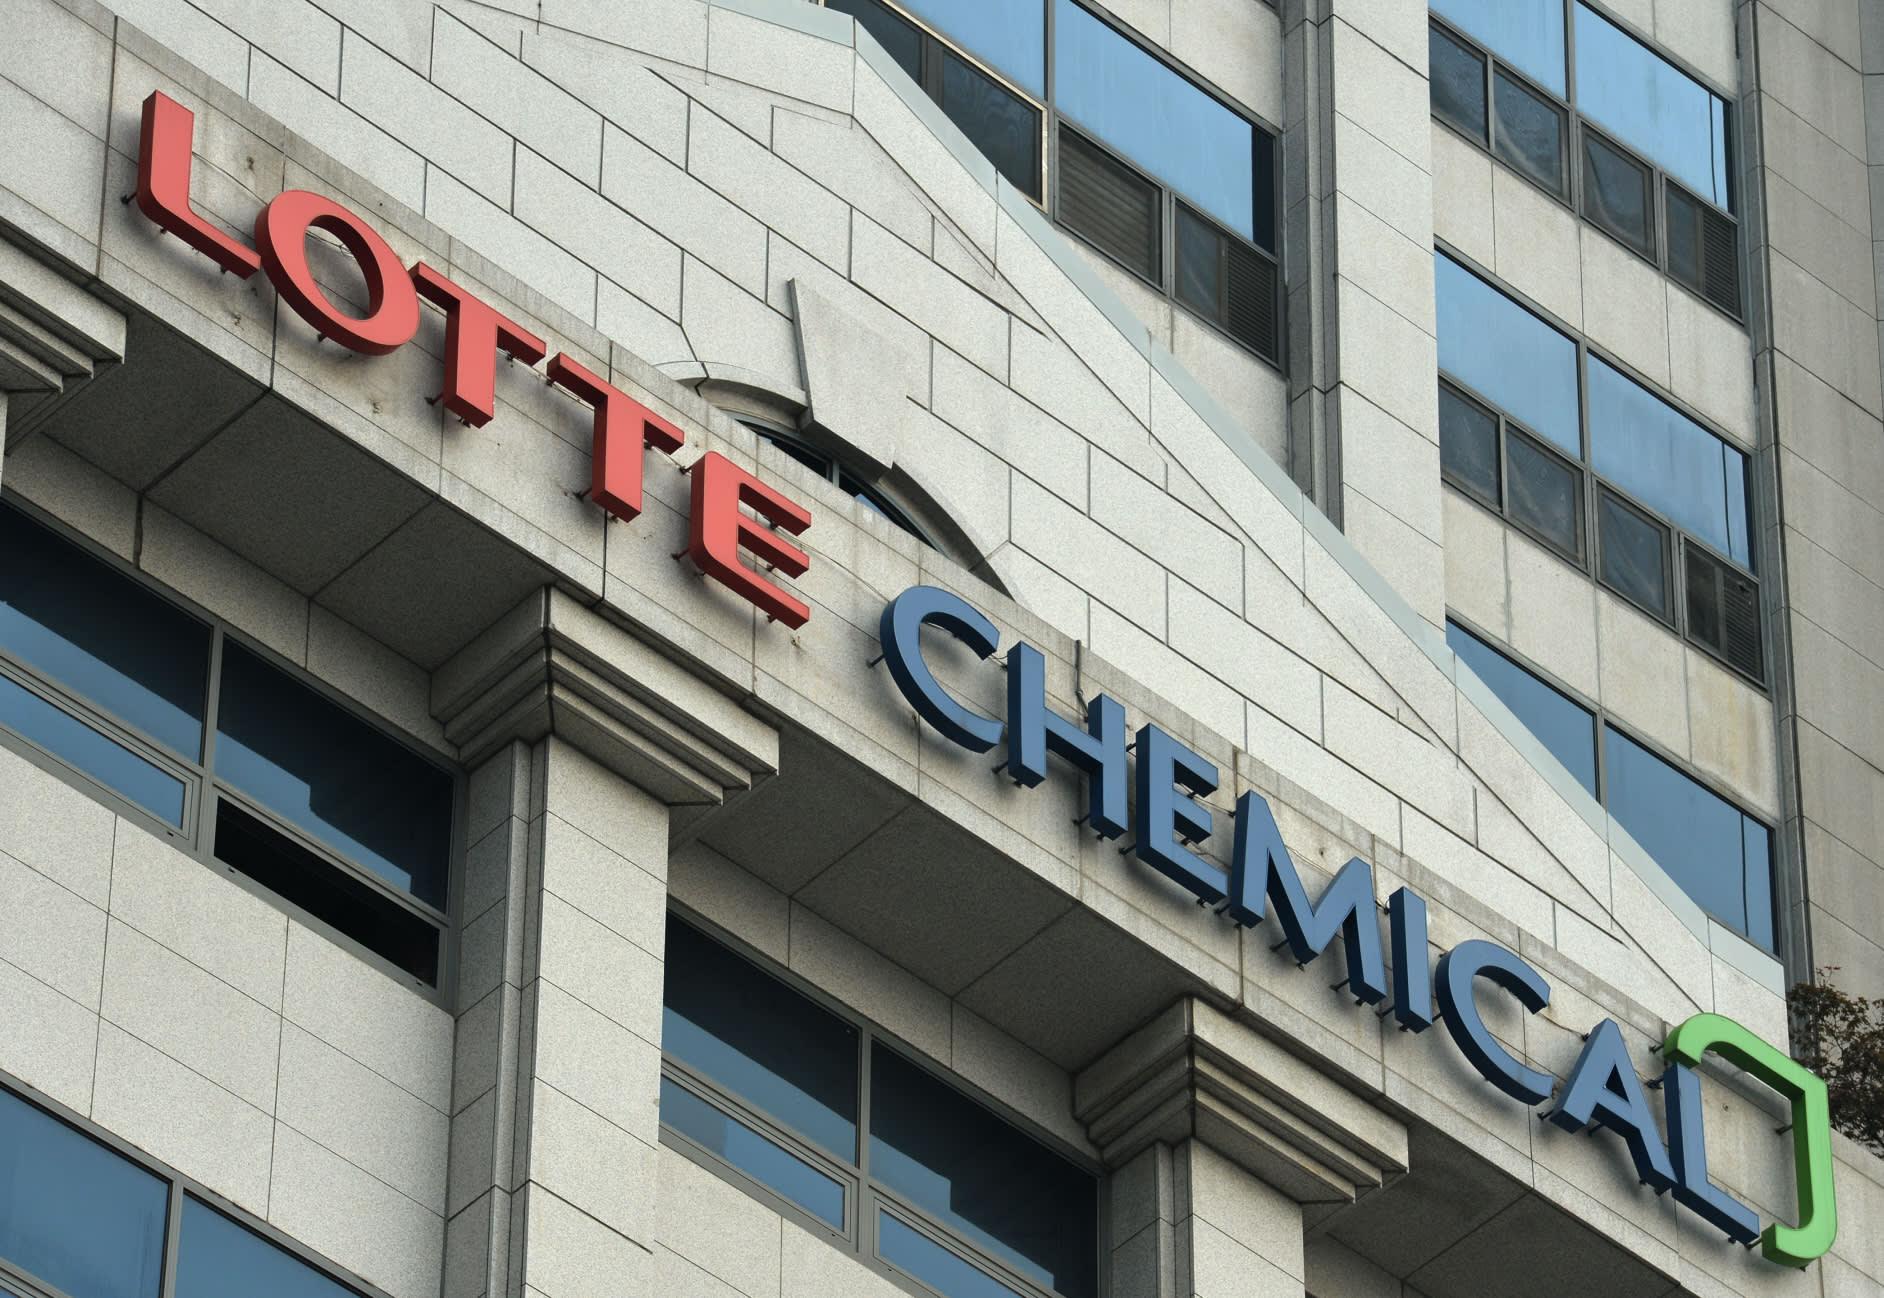 Lotte chemical titan ipo price